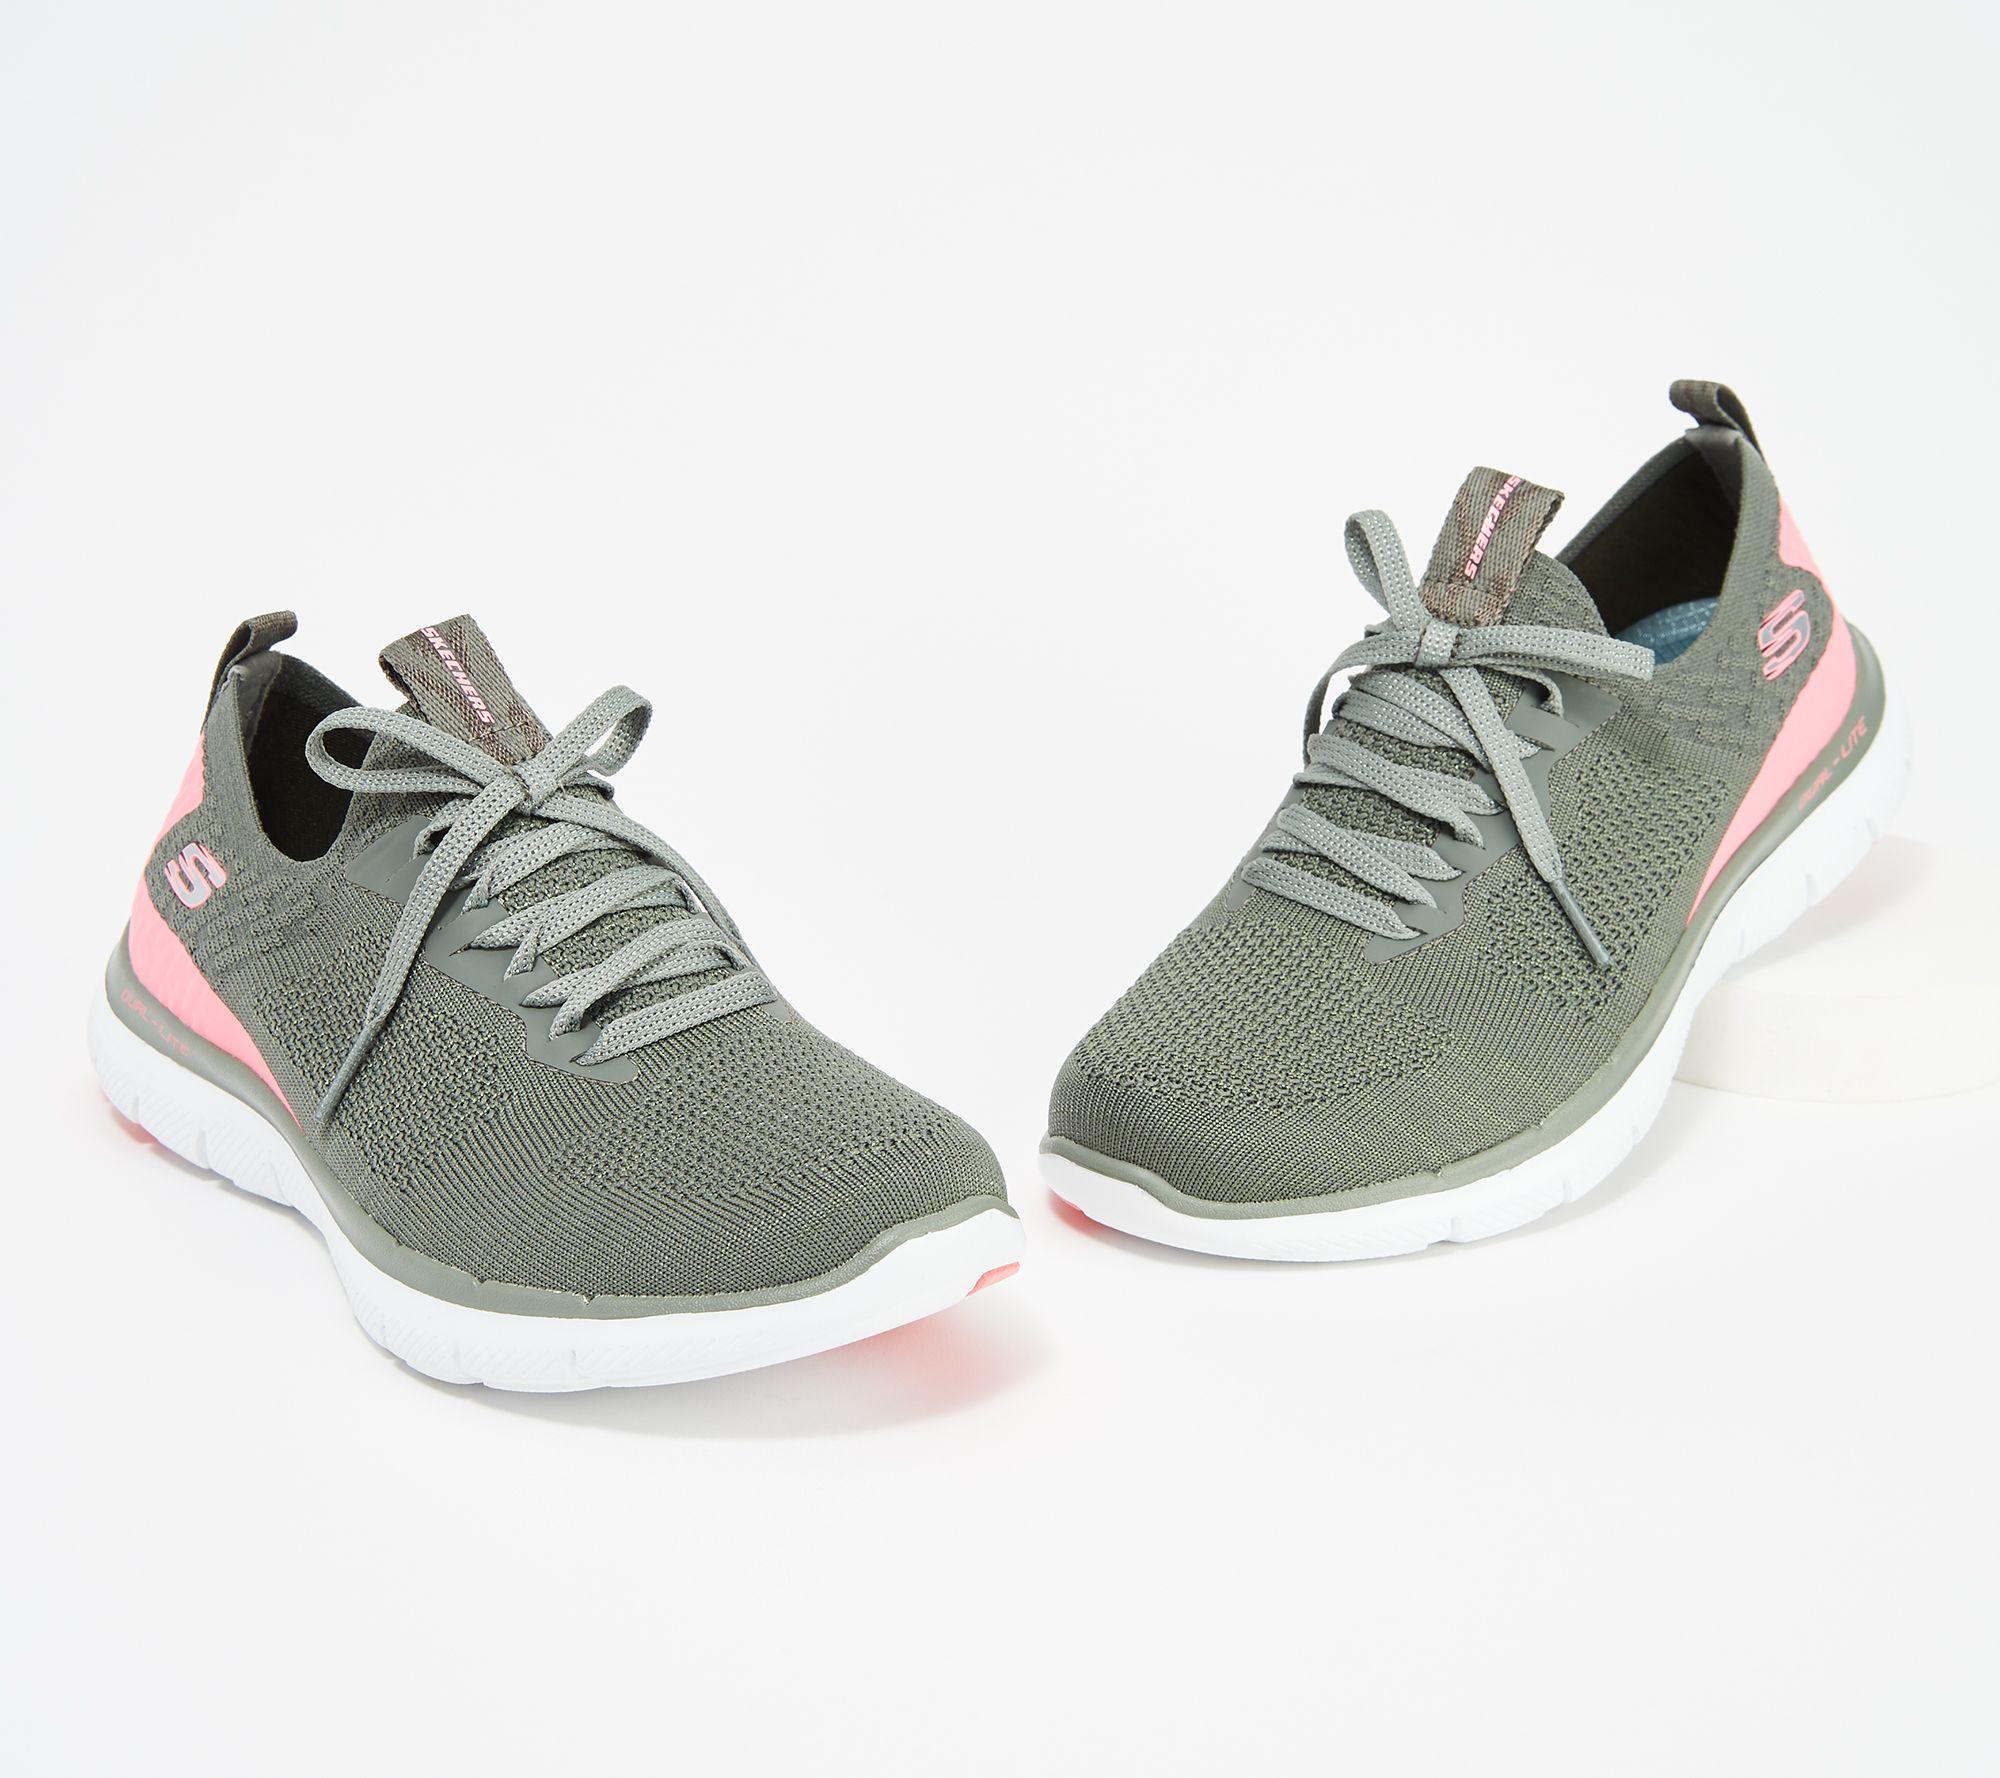 Skechers Flex Appeal 2 0 Stretch Knit Slip On Sneakers Turn Qvc Com